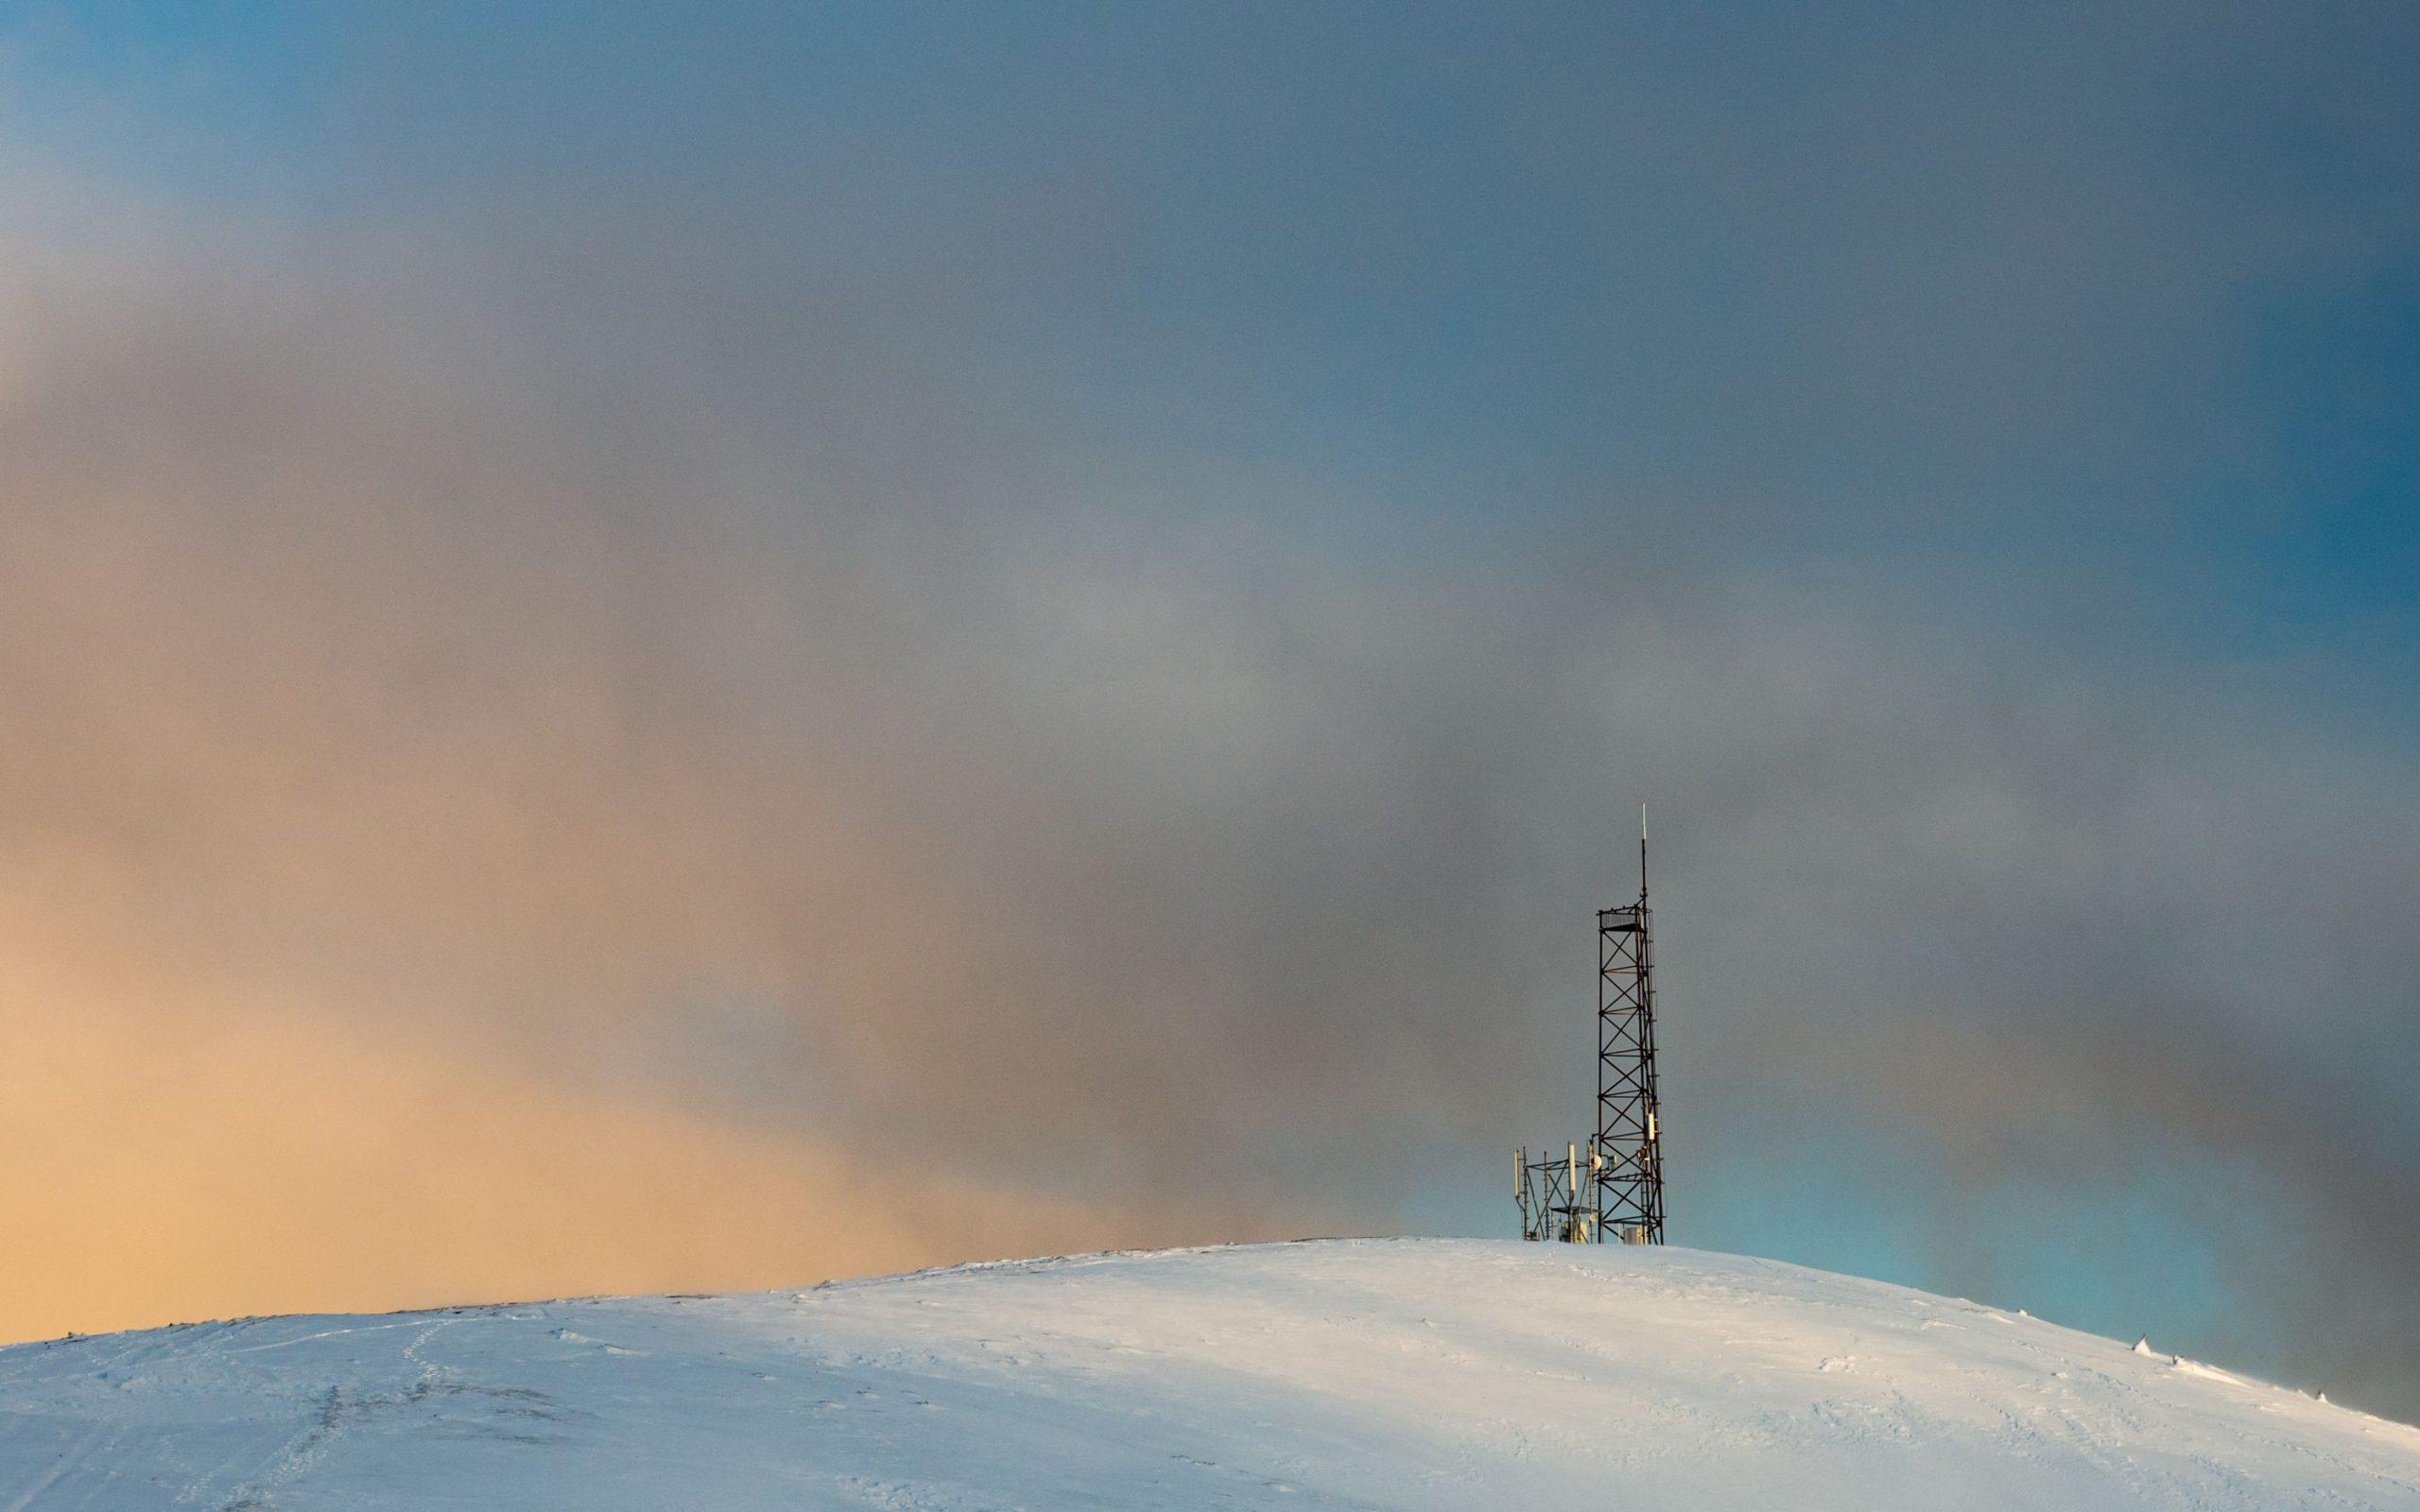 Sunrise over the antenna